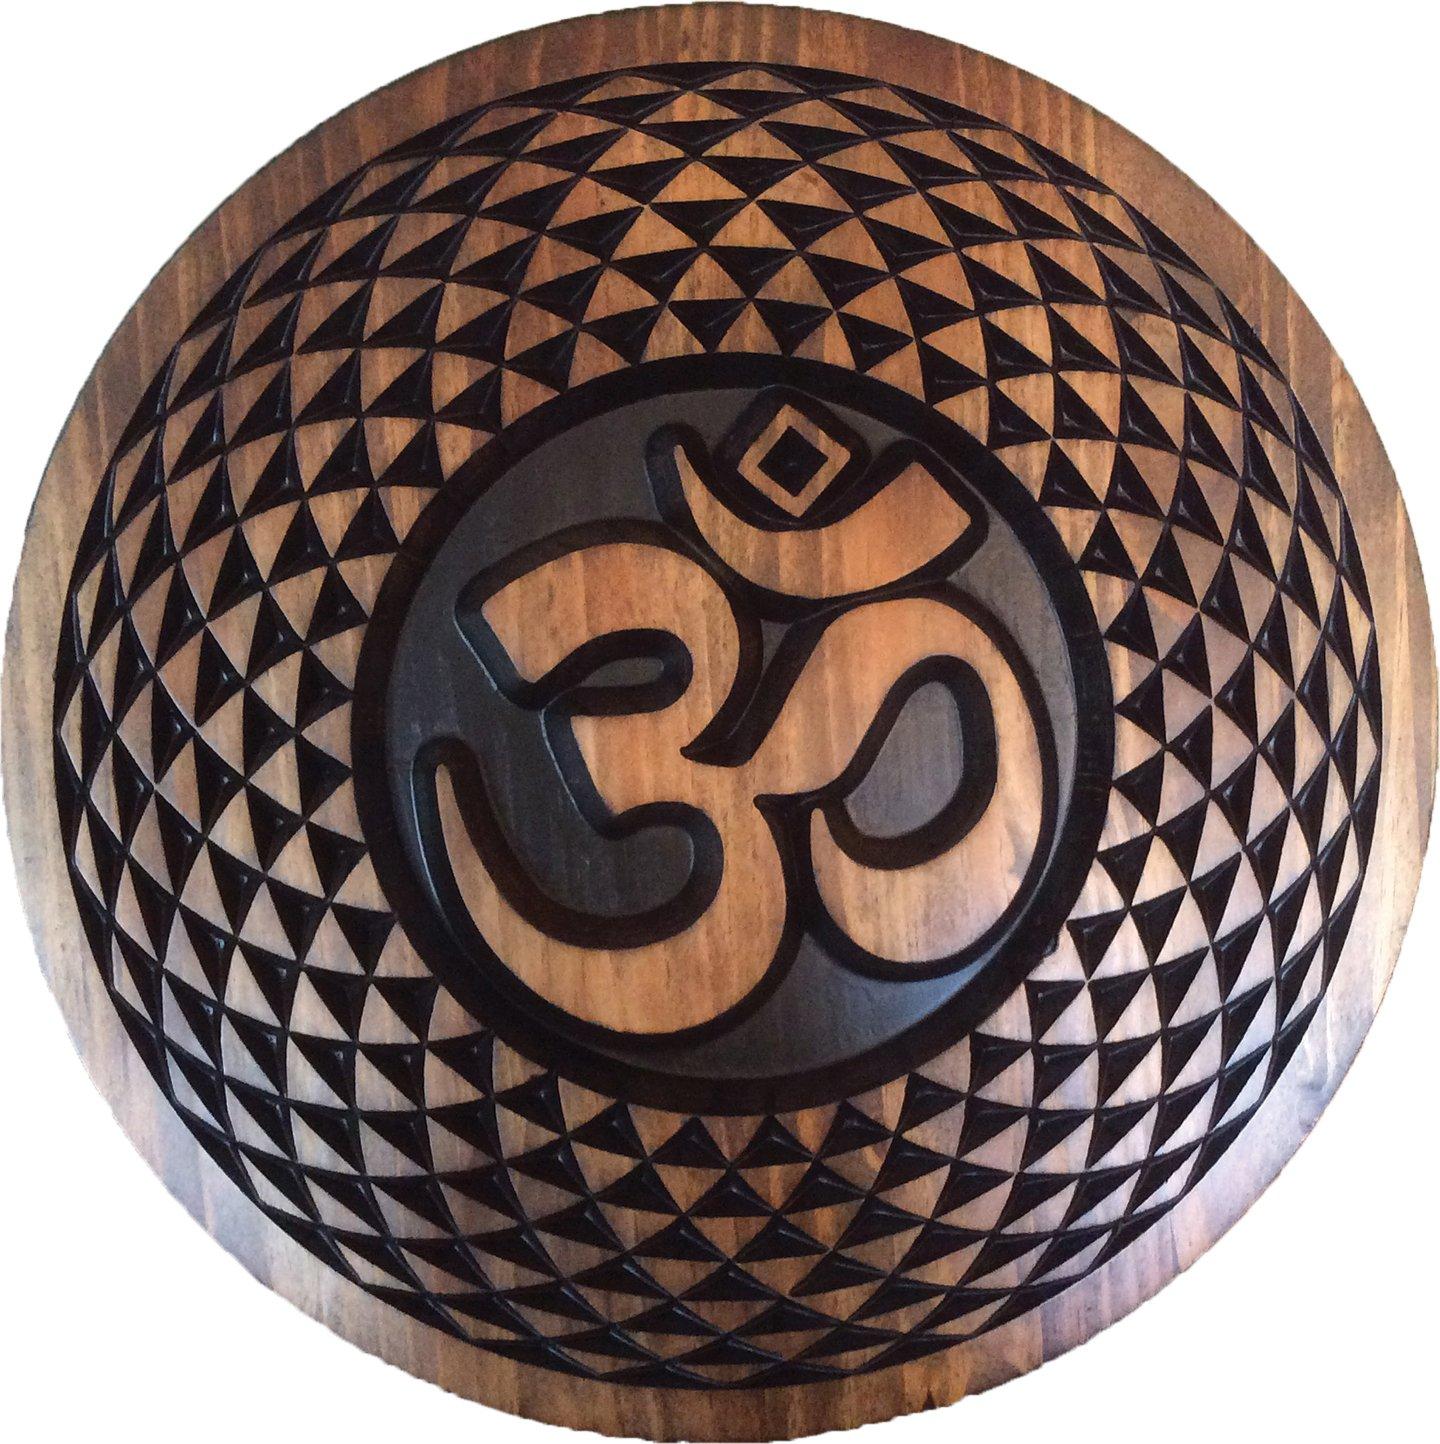 Spiritual Sacred Om - Aum (ॐ) Yoga Meditation, Torus Mandala, Pure Wood Wall Hanging Art Sculpture Decor (24'', Mahogany-Ebony)